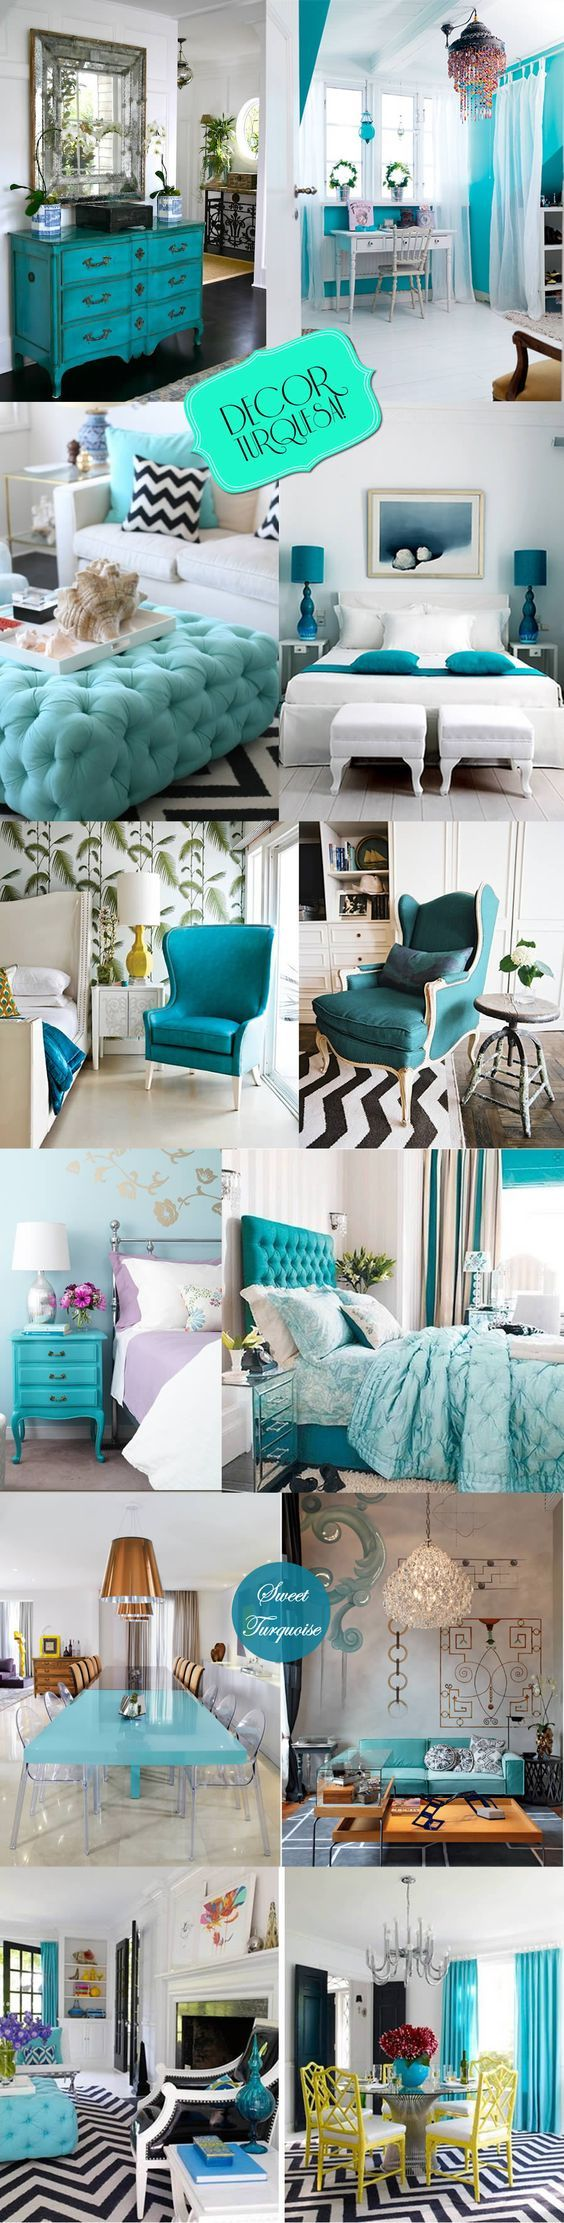 decoración-Turquesa-casa-azul-turqueza Xonei sin turquesa!  rsrsrs: